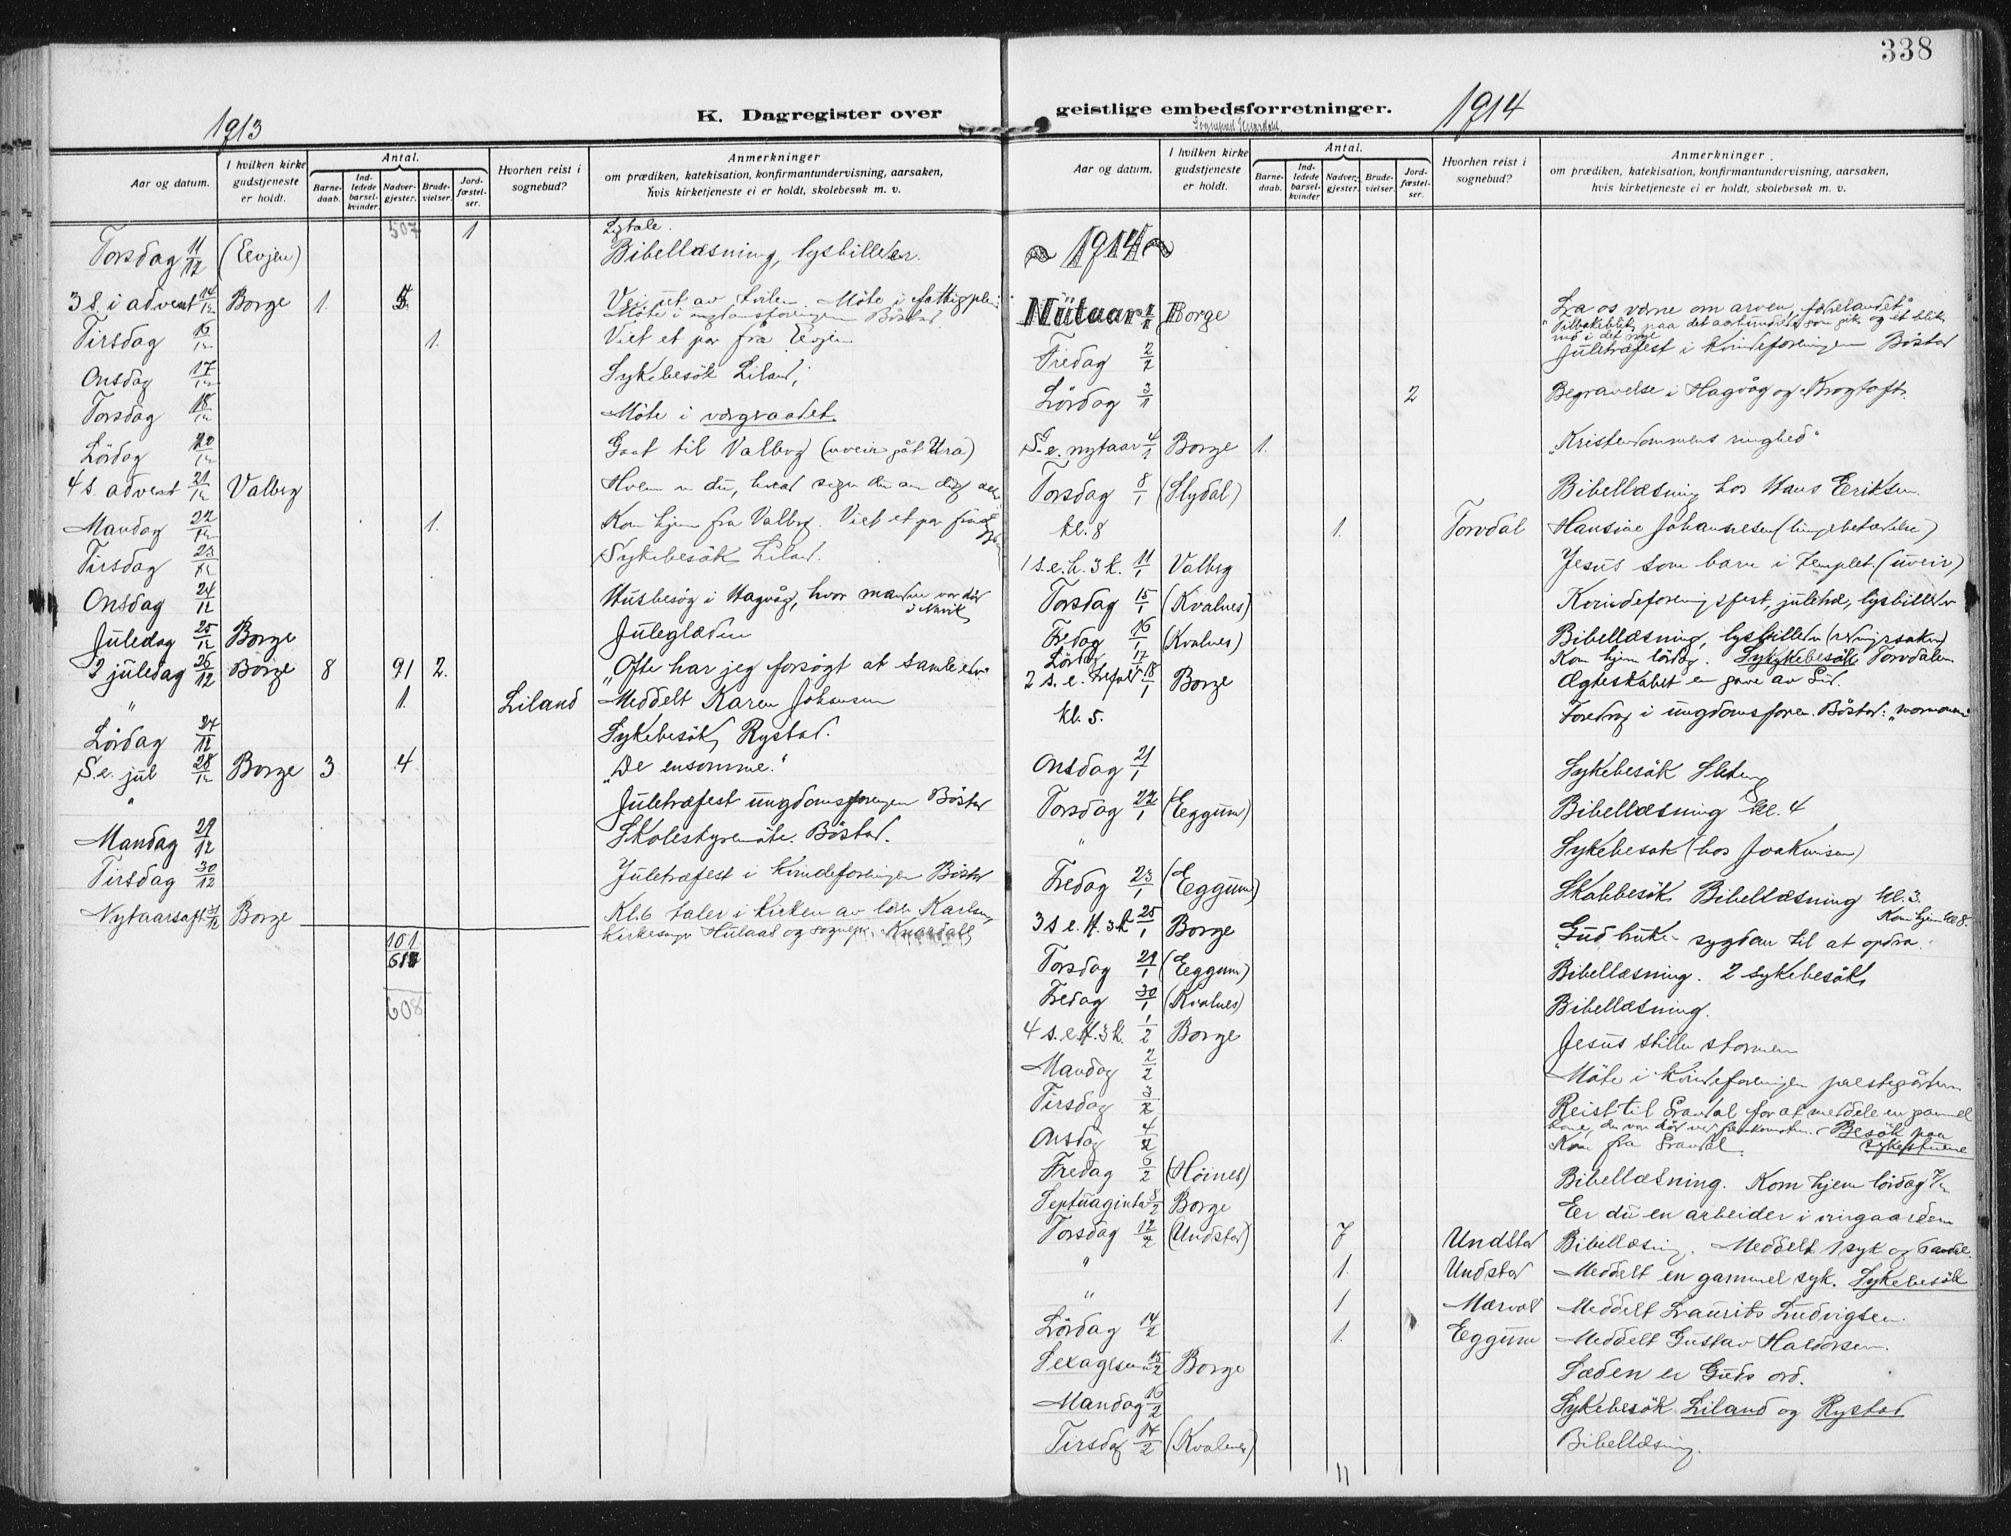 SAT, Ministerialprotokoller, klokkerbøker og fødselsregistre - Nordland, 880/L1135: Ministerialbok nr. 880A09, 1908-1919, s. 338